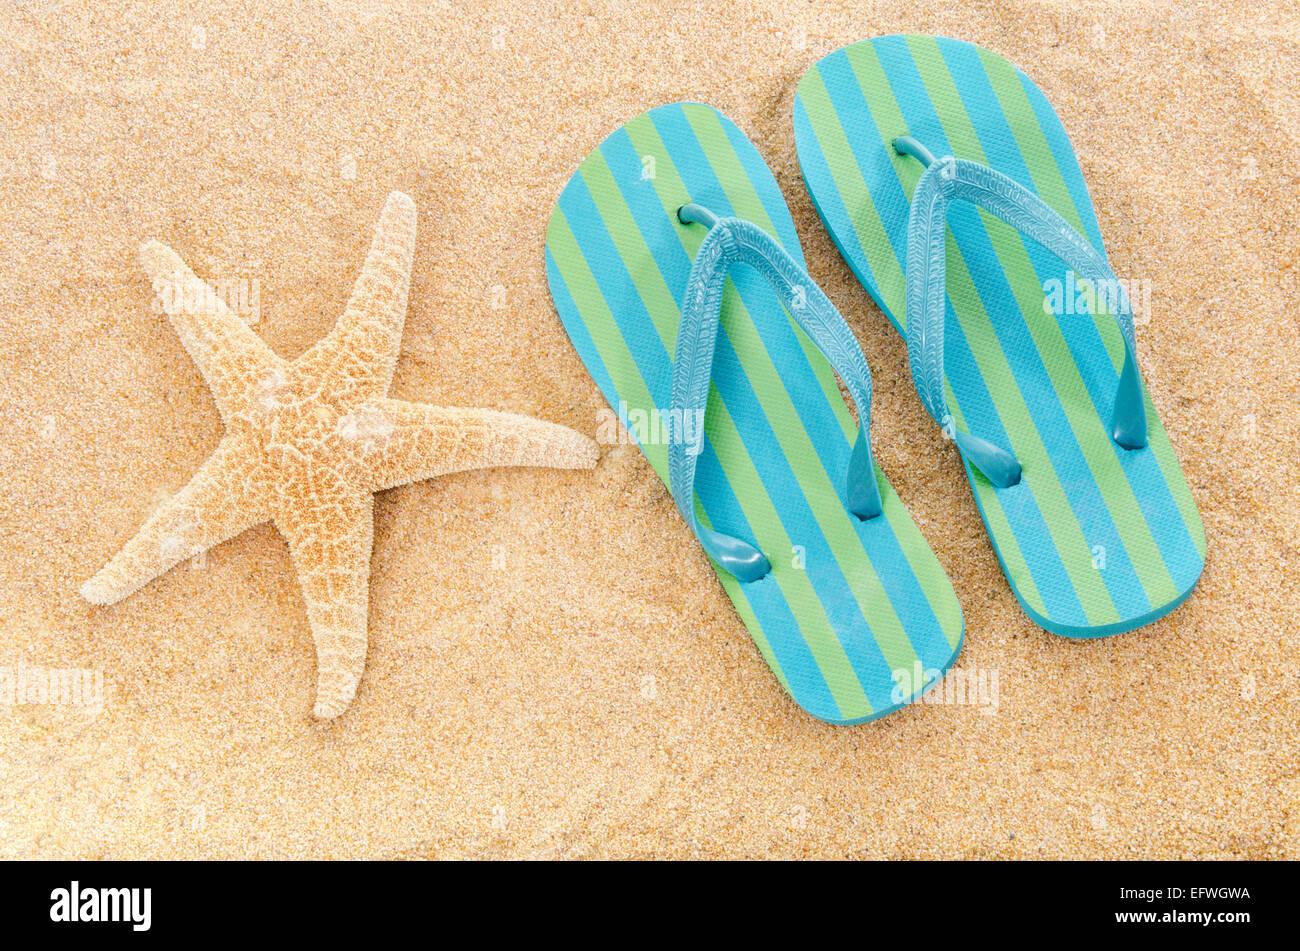 striped-flip-flops-rubber-sandals-beach-slippers-on-sandy-beach-sea-EFWGWA.jpg